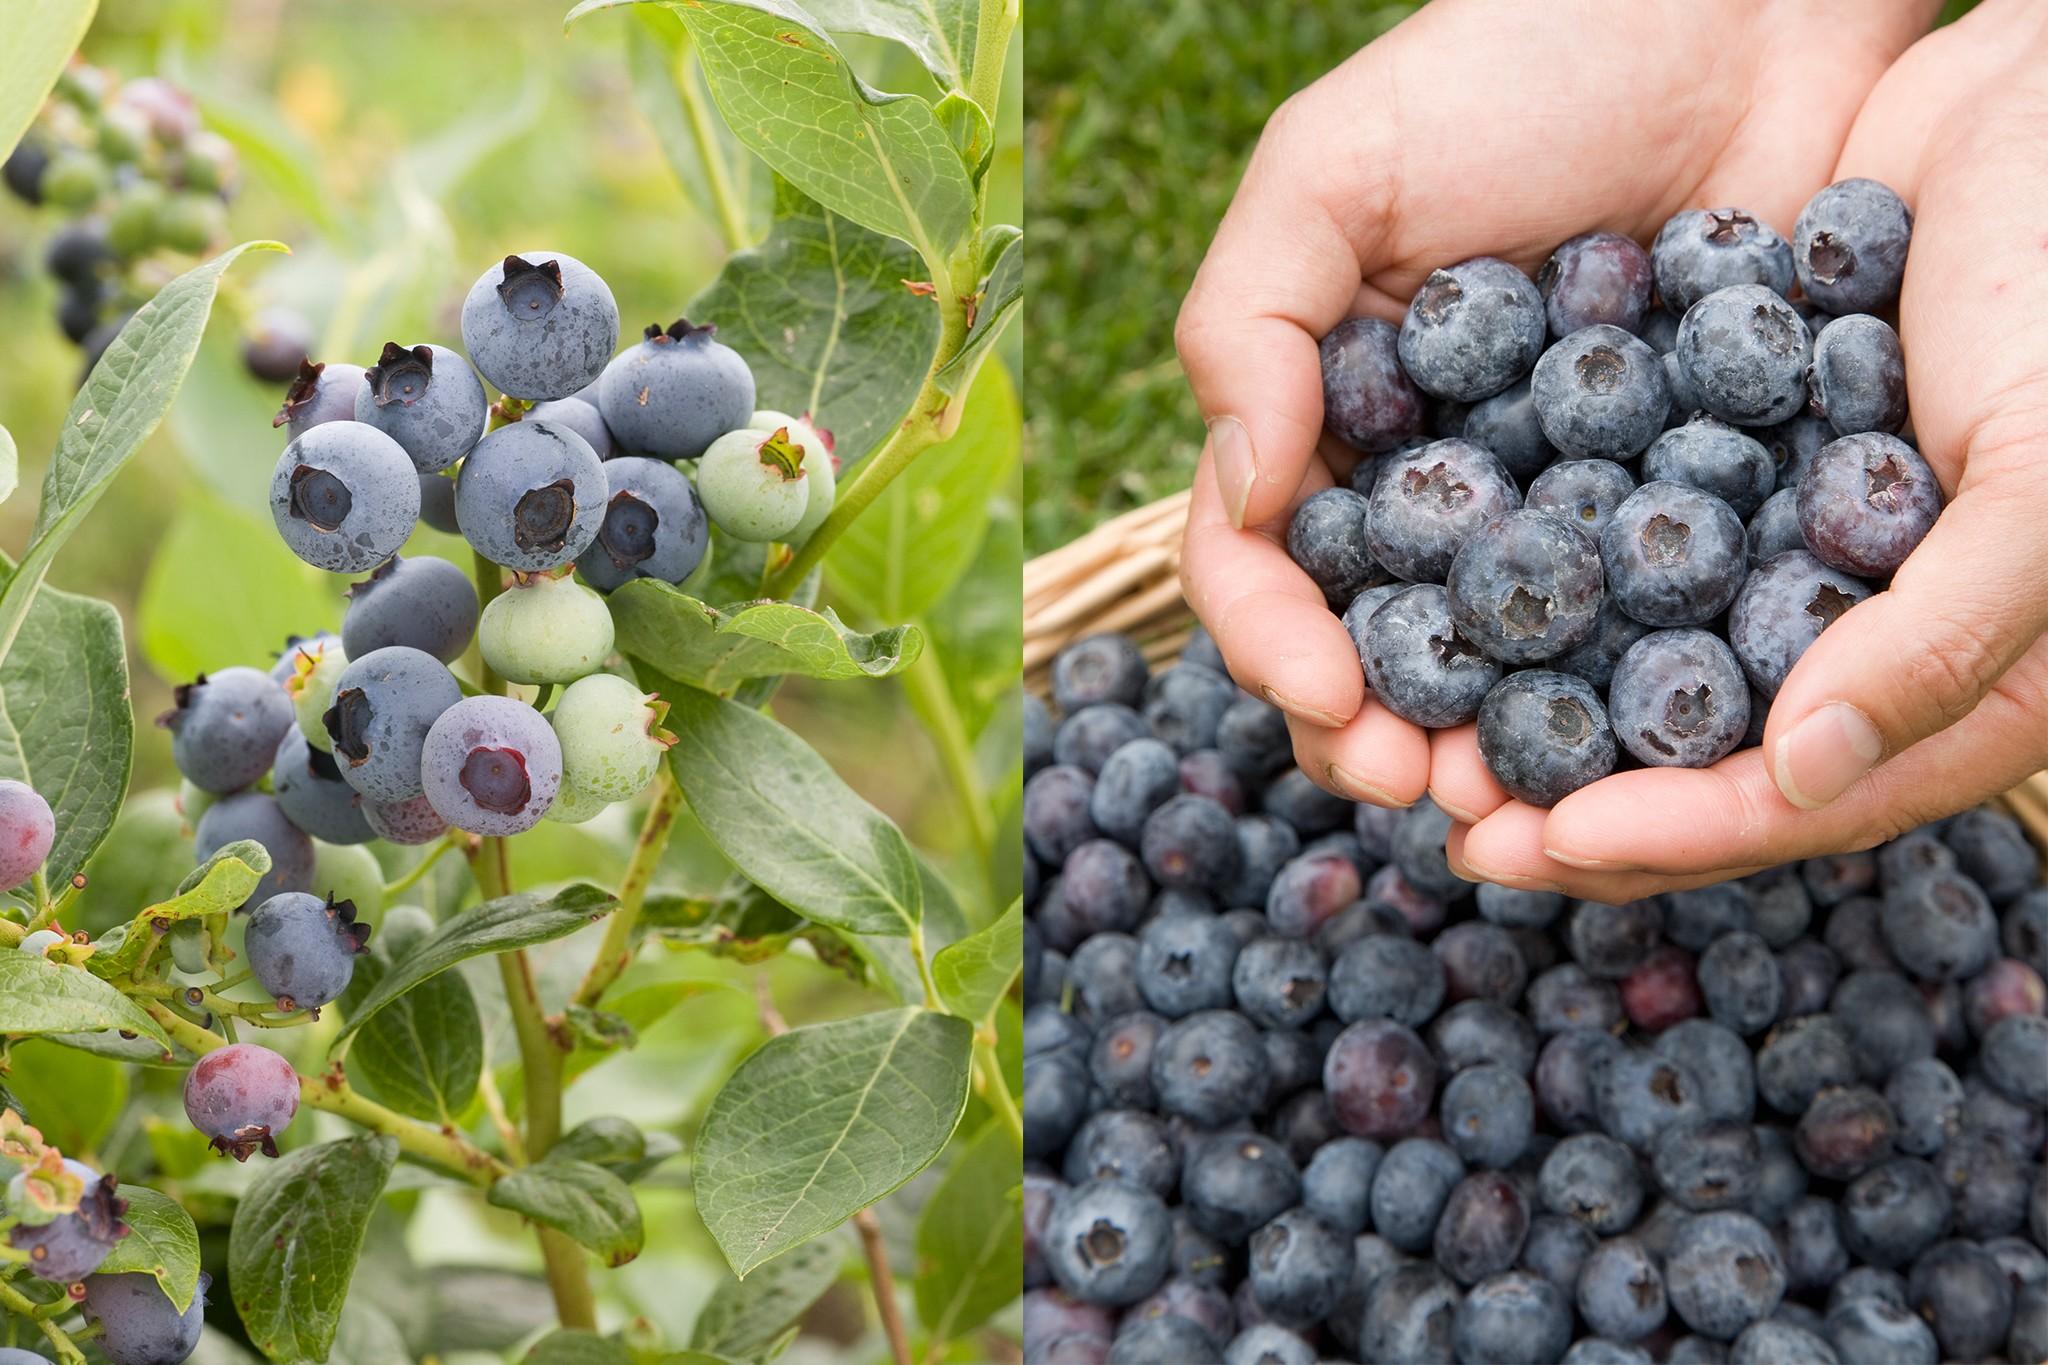 pomona-fruits-blueberries-2048-1365